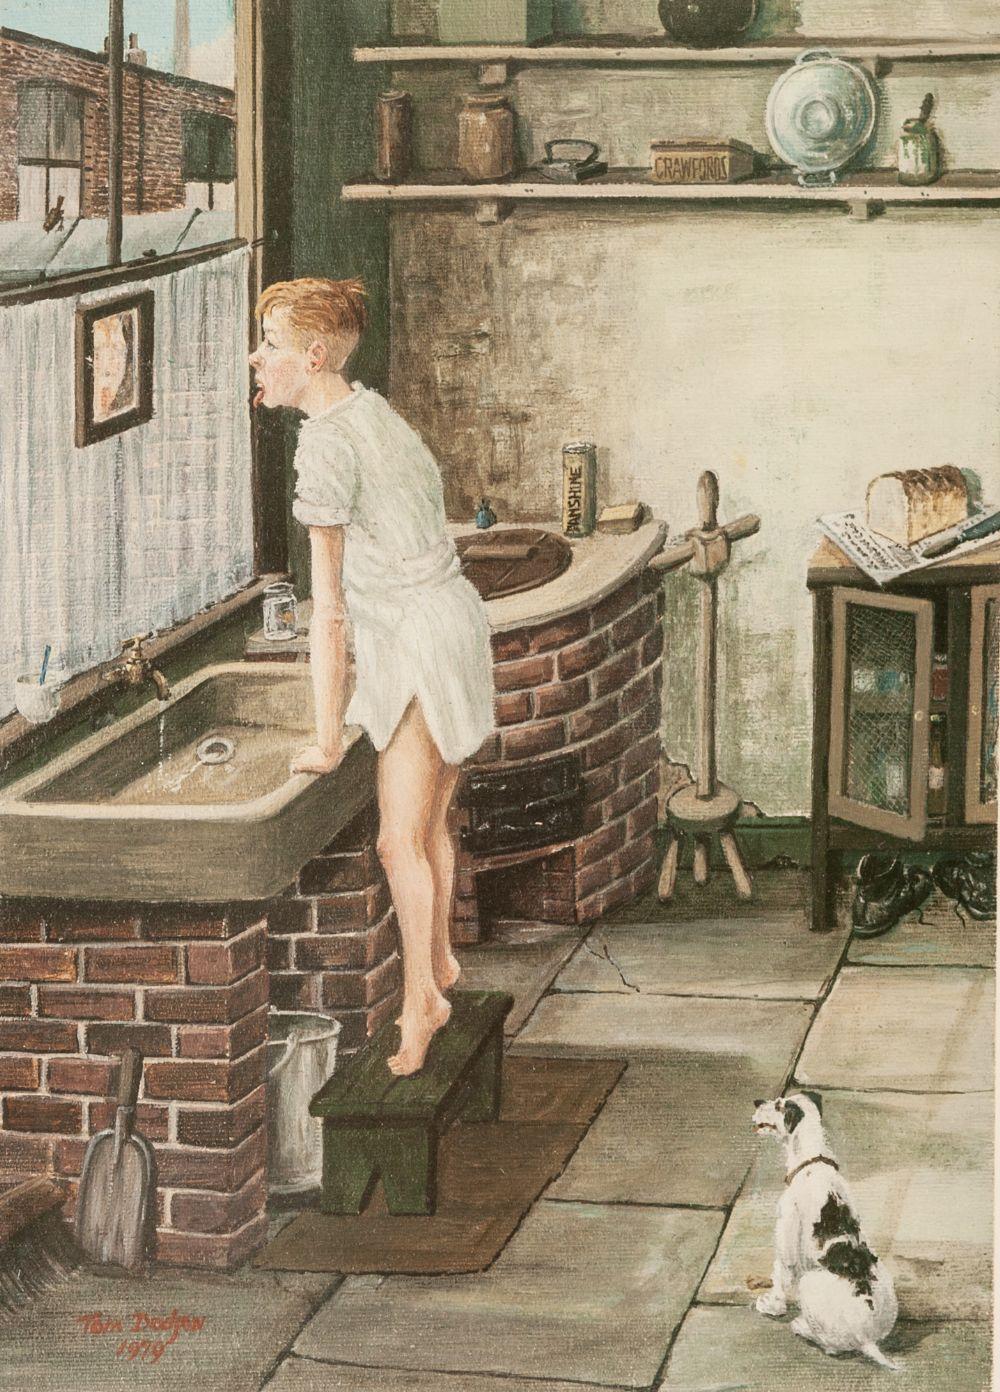 Lot 59 - TOM DODSON (1910 - 1991) ARTIST SIGNED COLOUR PRINT 'Boy at kitchen sink' Blind stamped and signed